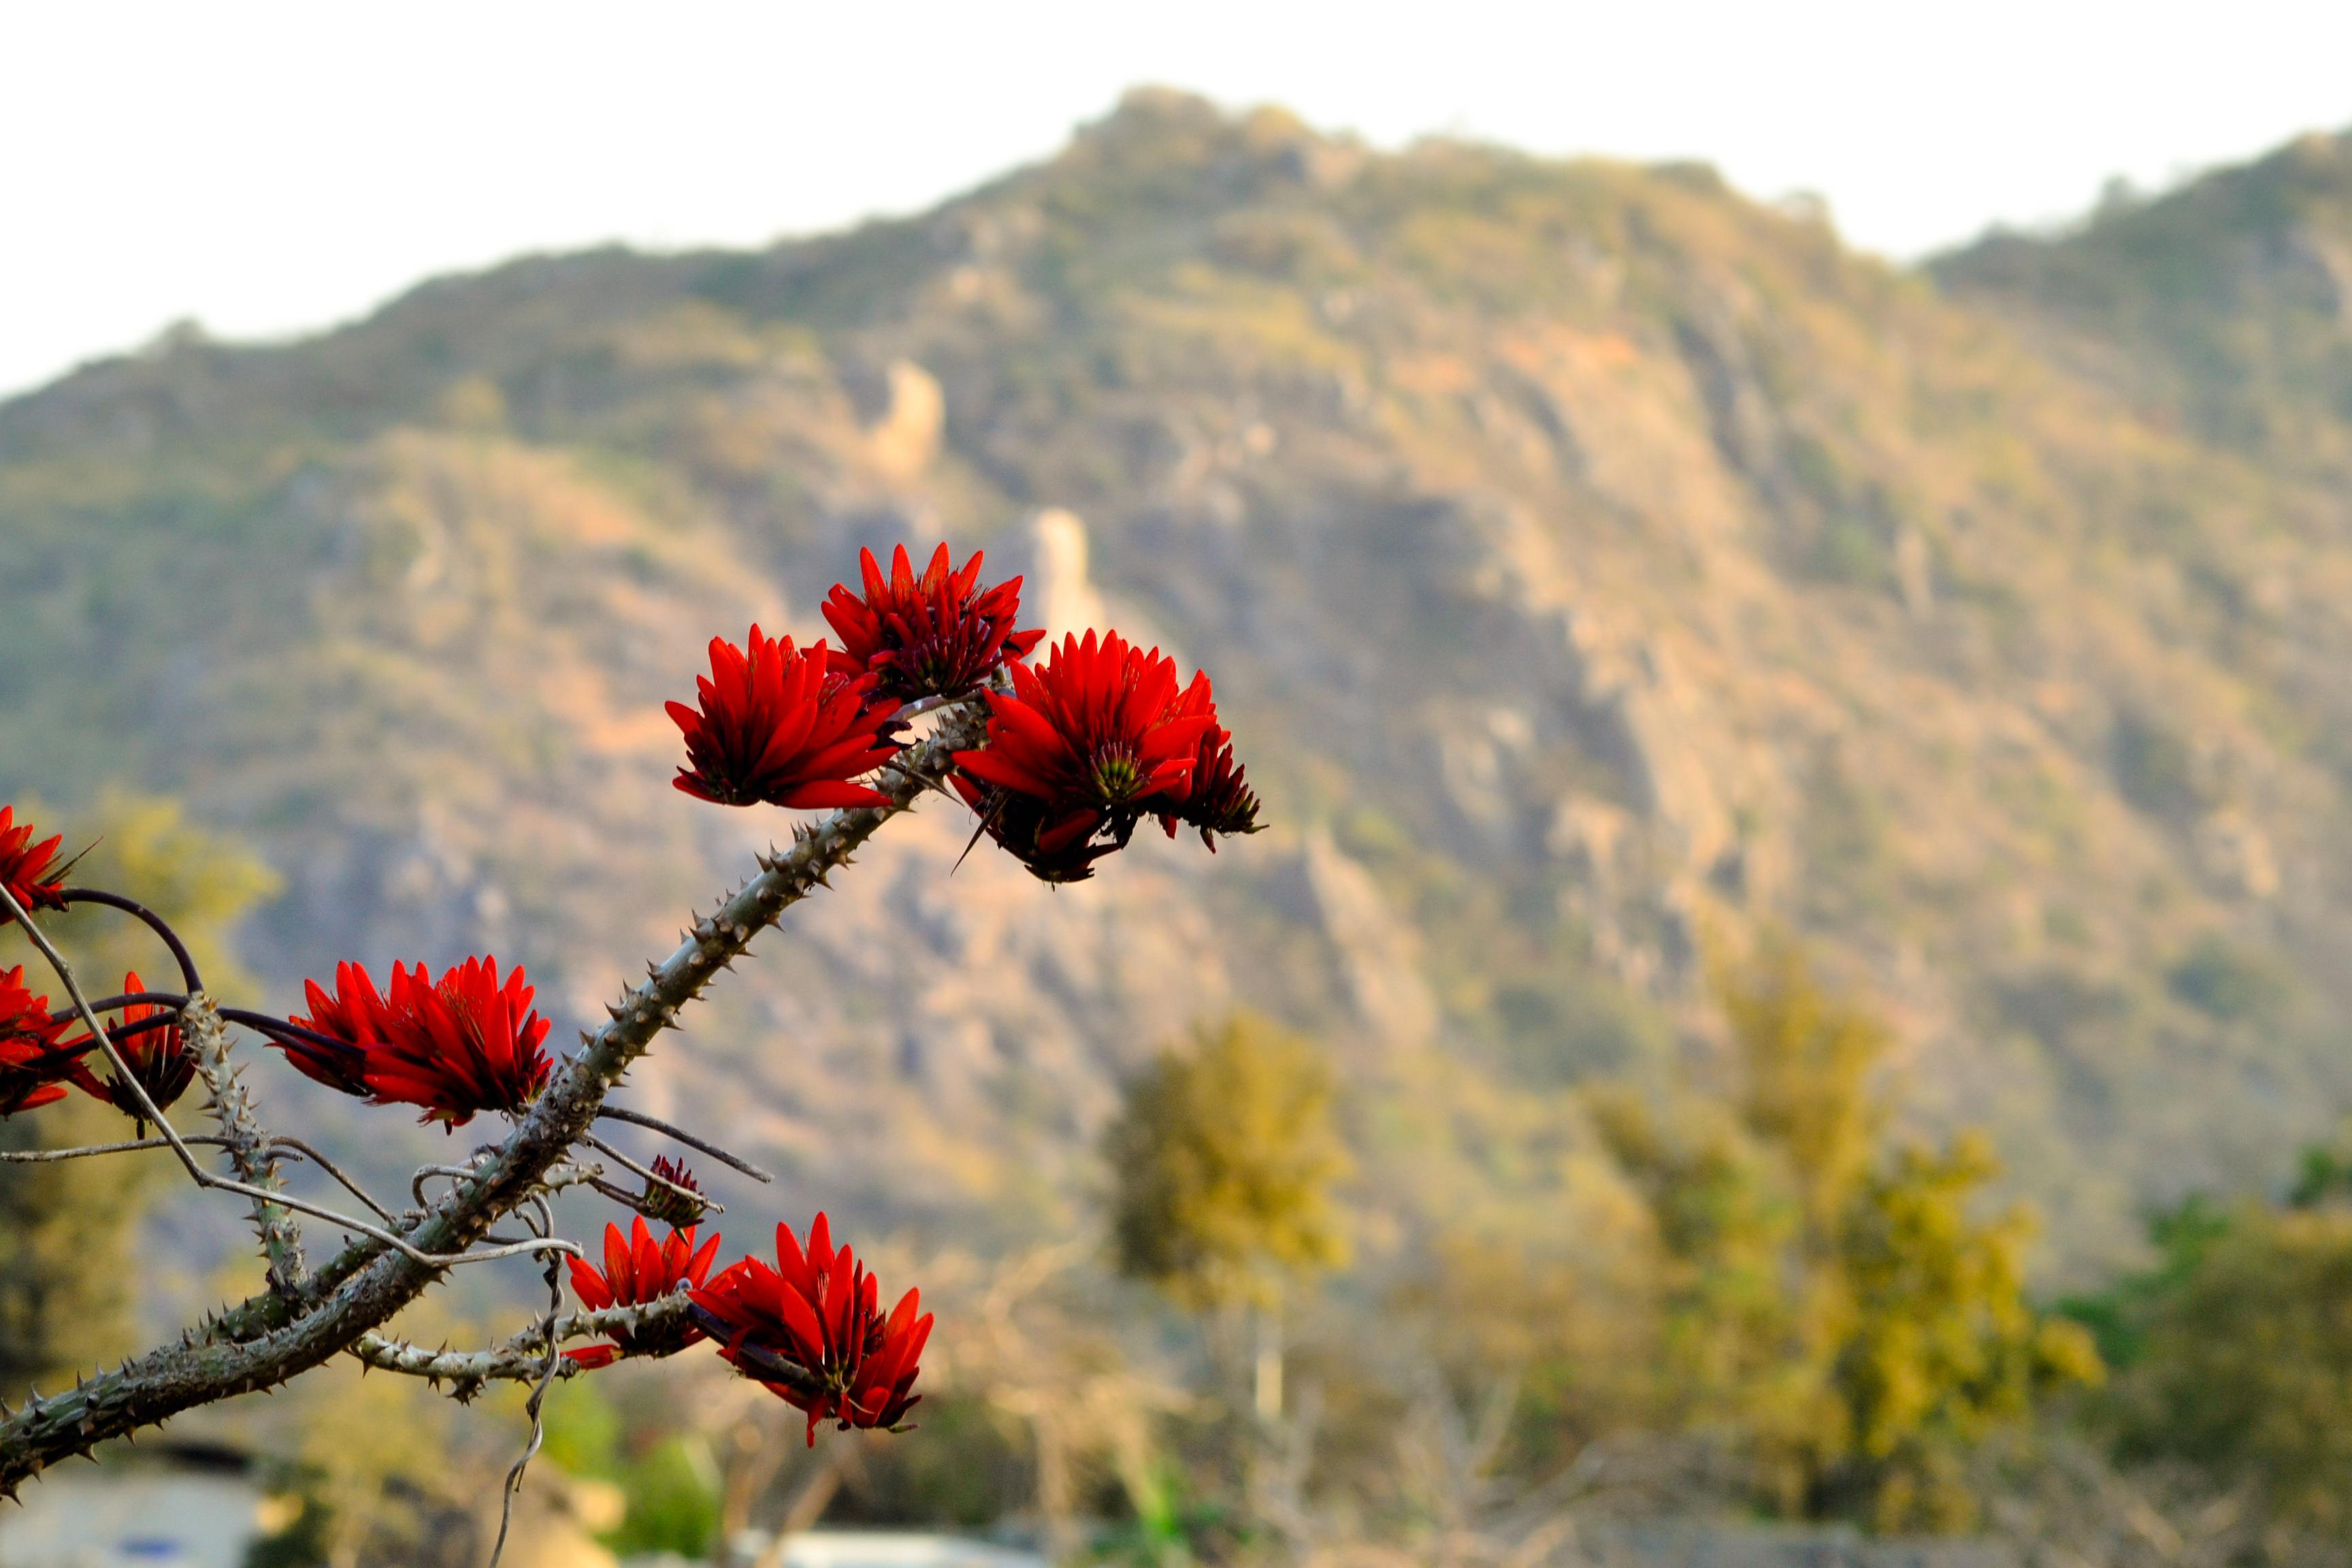 File:Palash flower.jpg - Wikimedia Commons Palash Flowers Images